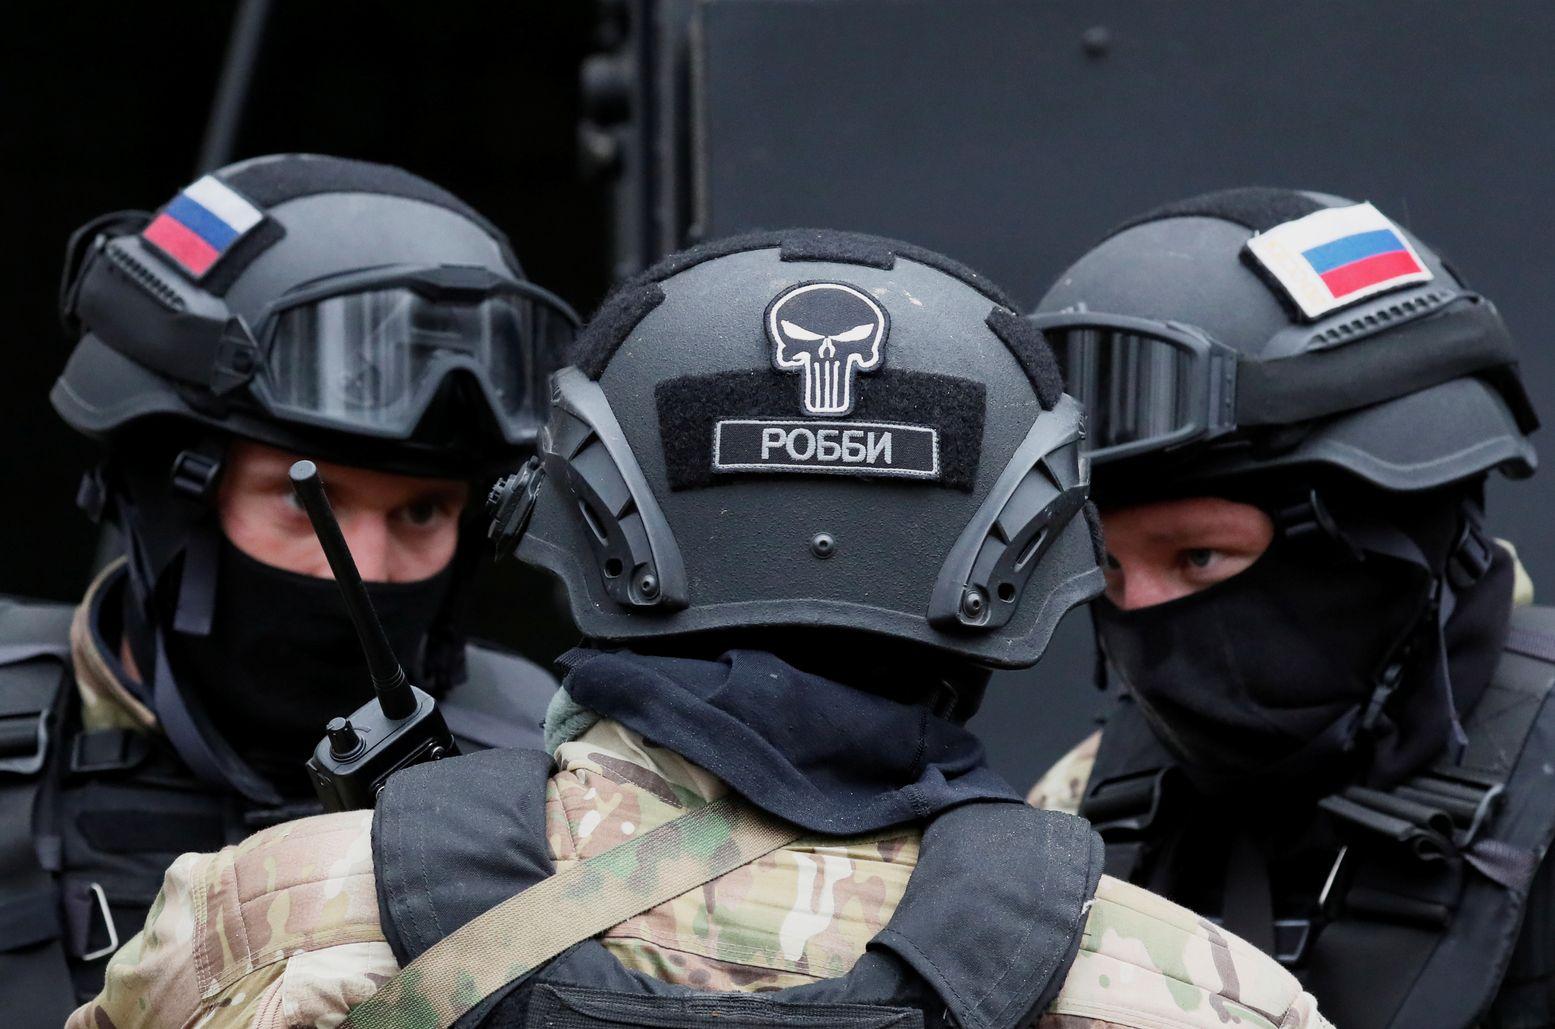 Let's Talk About Russia's Secret Special Forces Unit | The National Interest